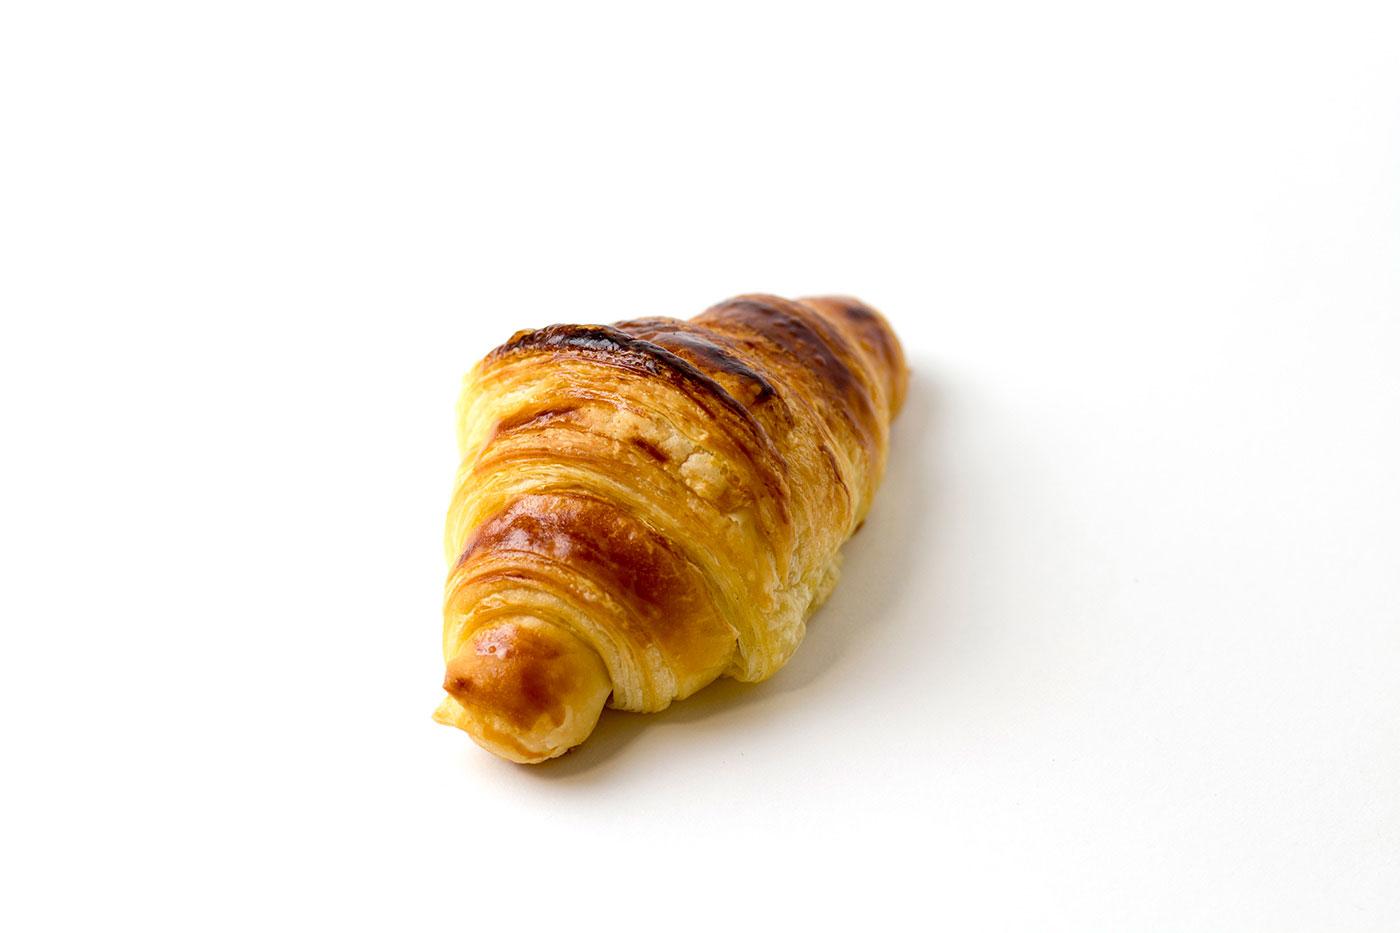 croissant-elfotogastro-fotografo-de-comida-fotografo-gastronomico